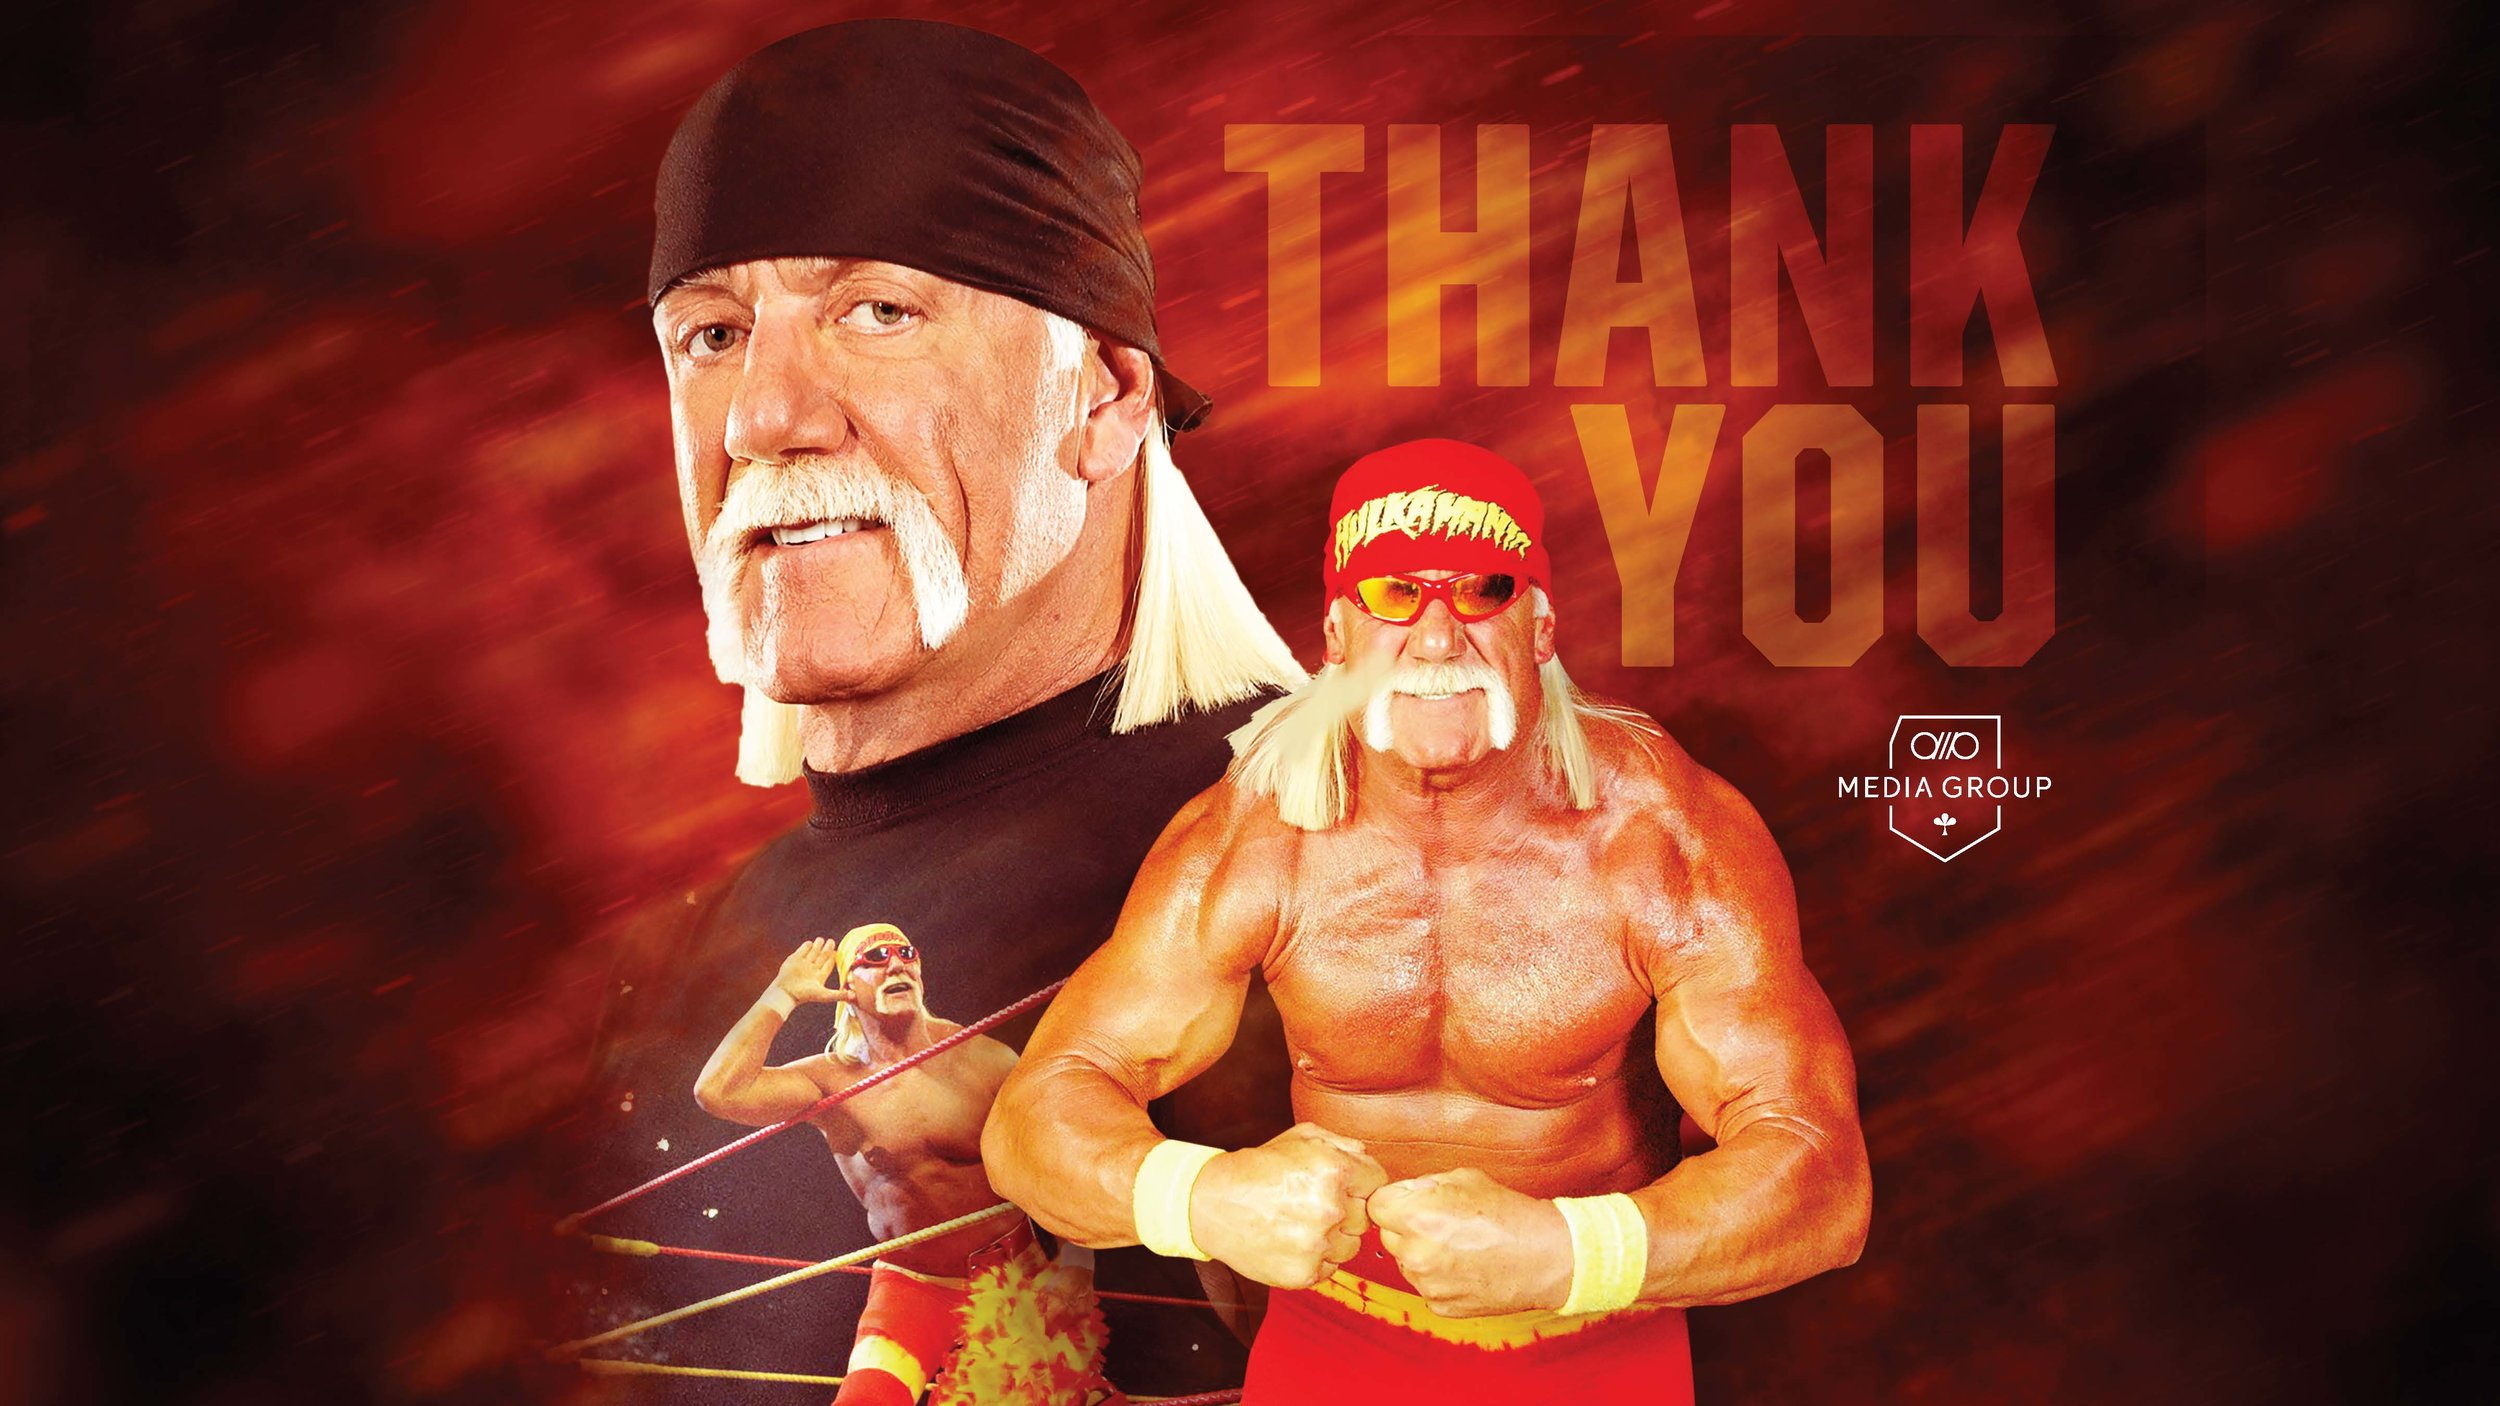 Hulk-Hogan-deck_Page_10.jpg